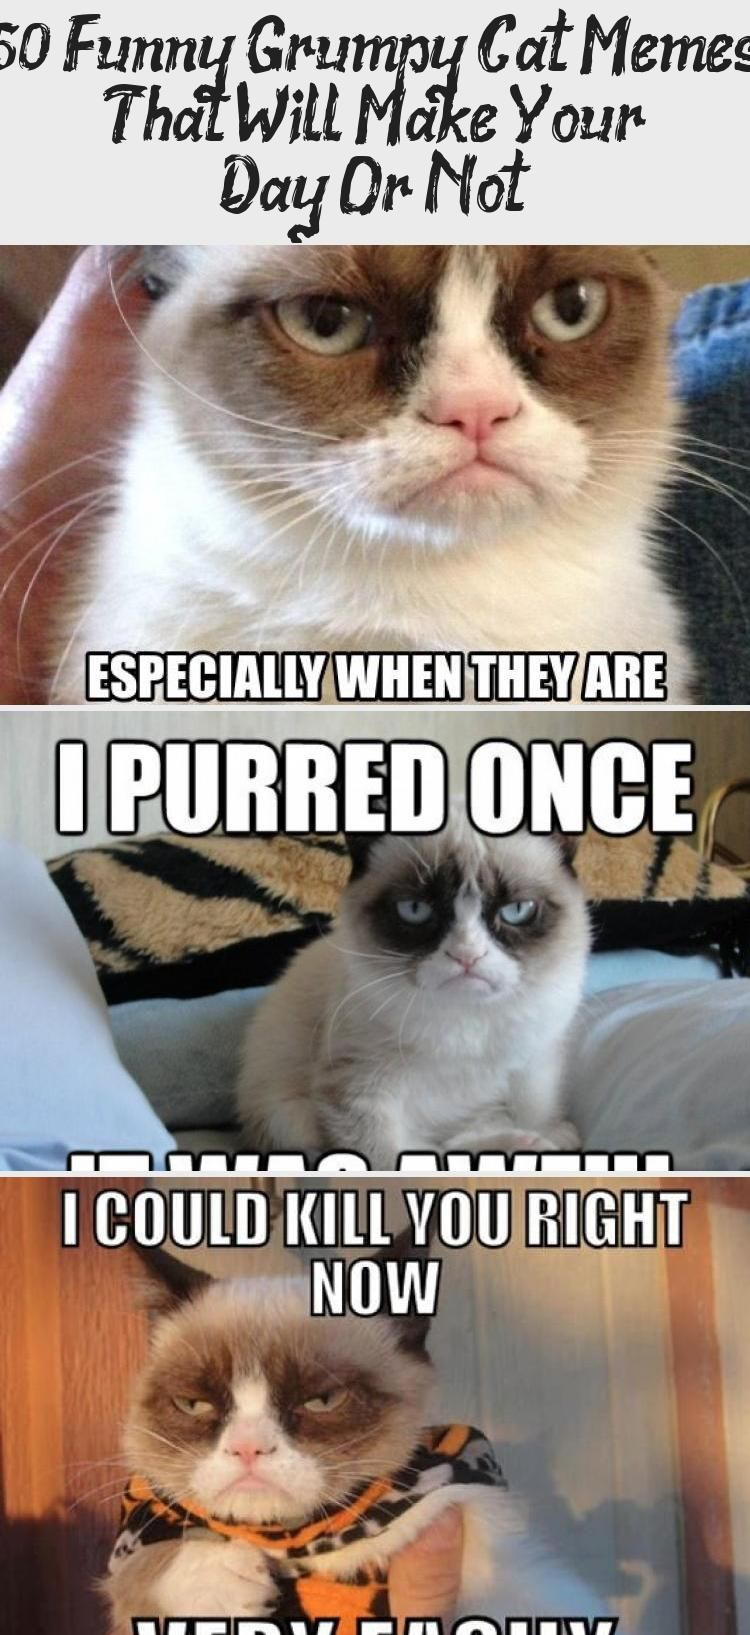 My Blog En Blog in 2020 Funny grumpy cat memes, Grumpy